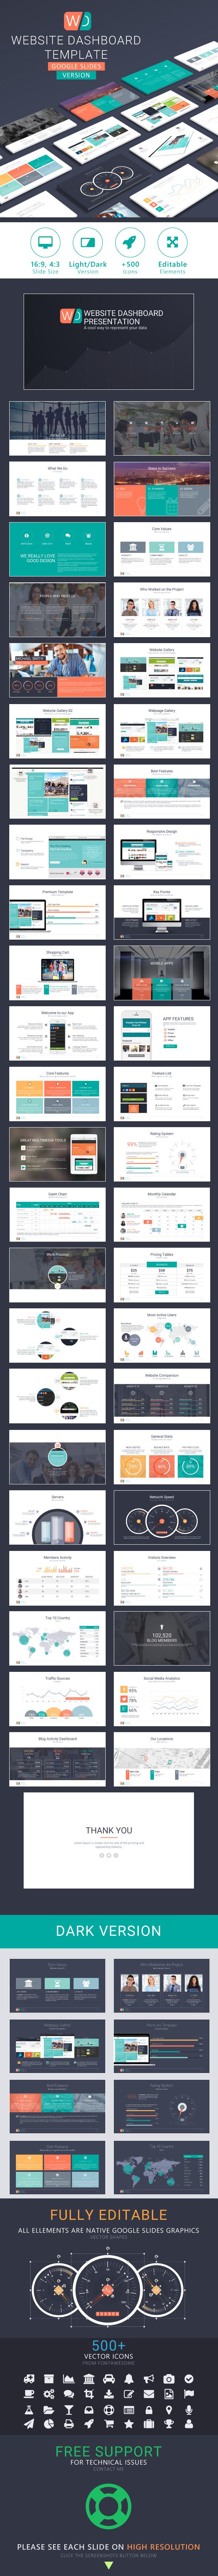 Website Dashboard Google Slides Presentation by adriandragne ...